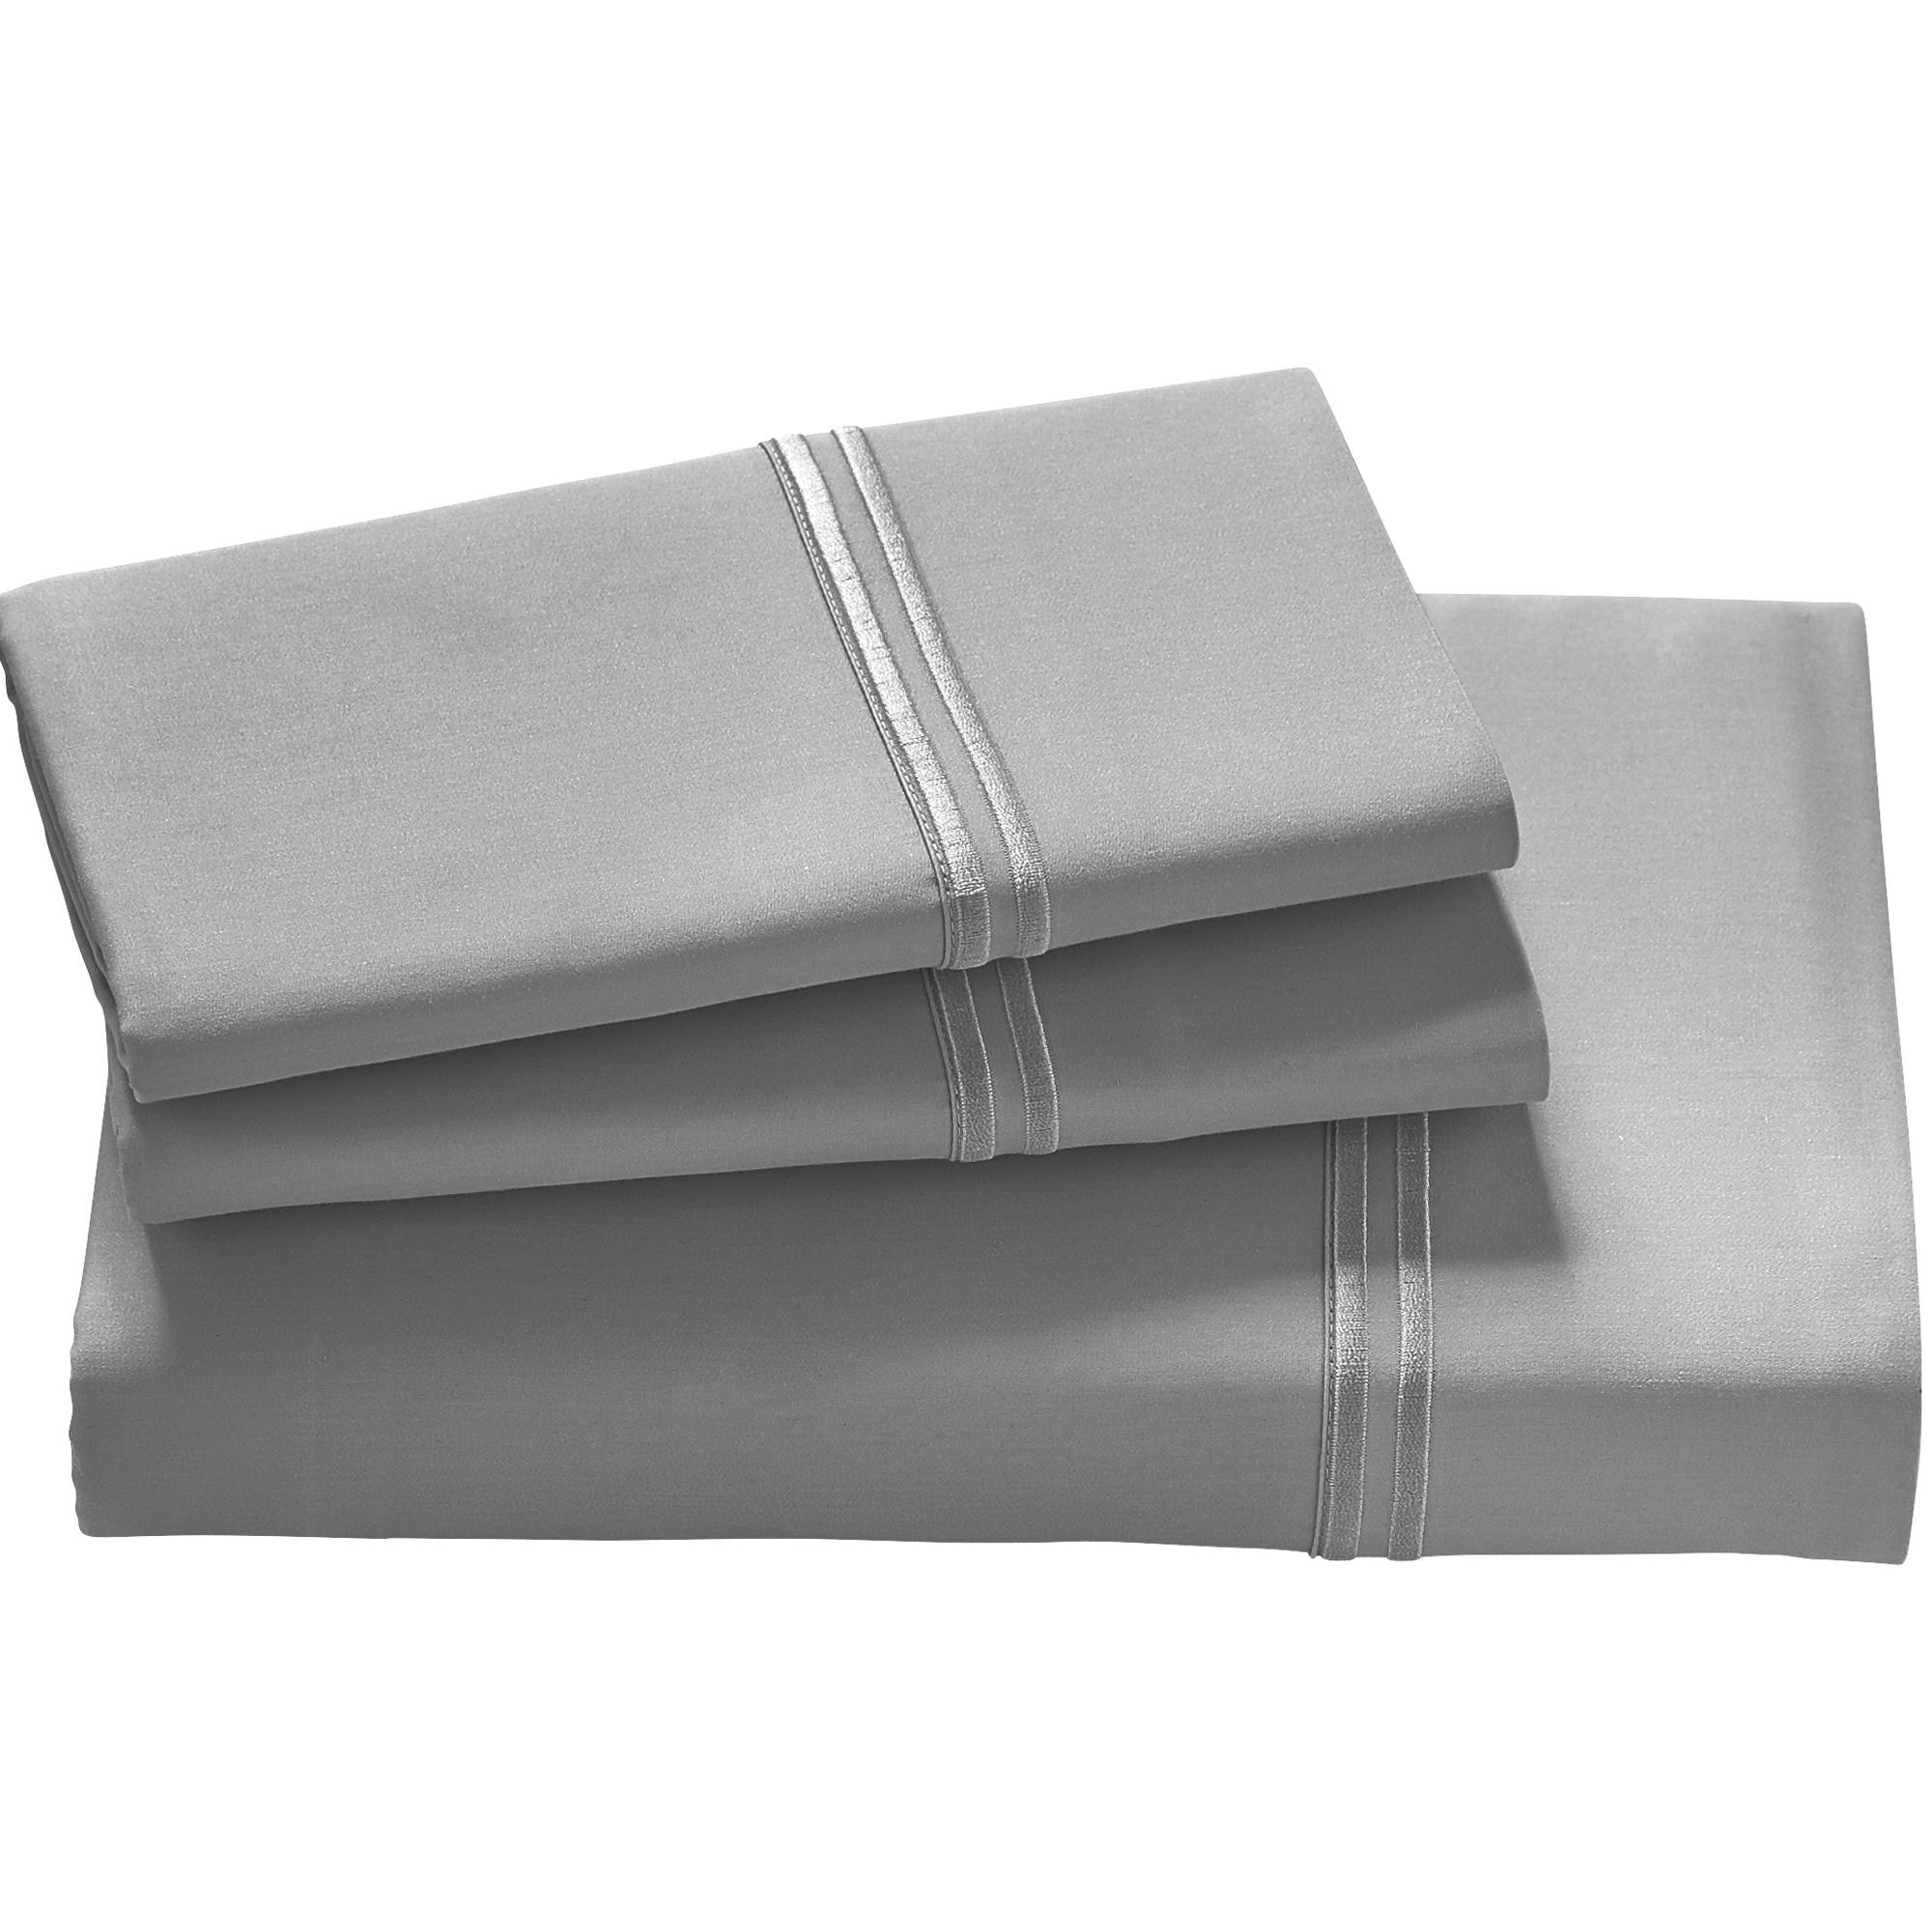 Purecare | Elements Dove Gray Split California King Modal Sheet Set